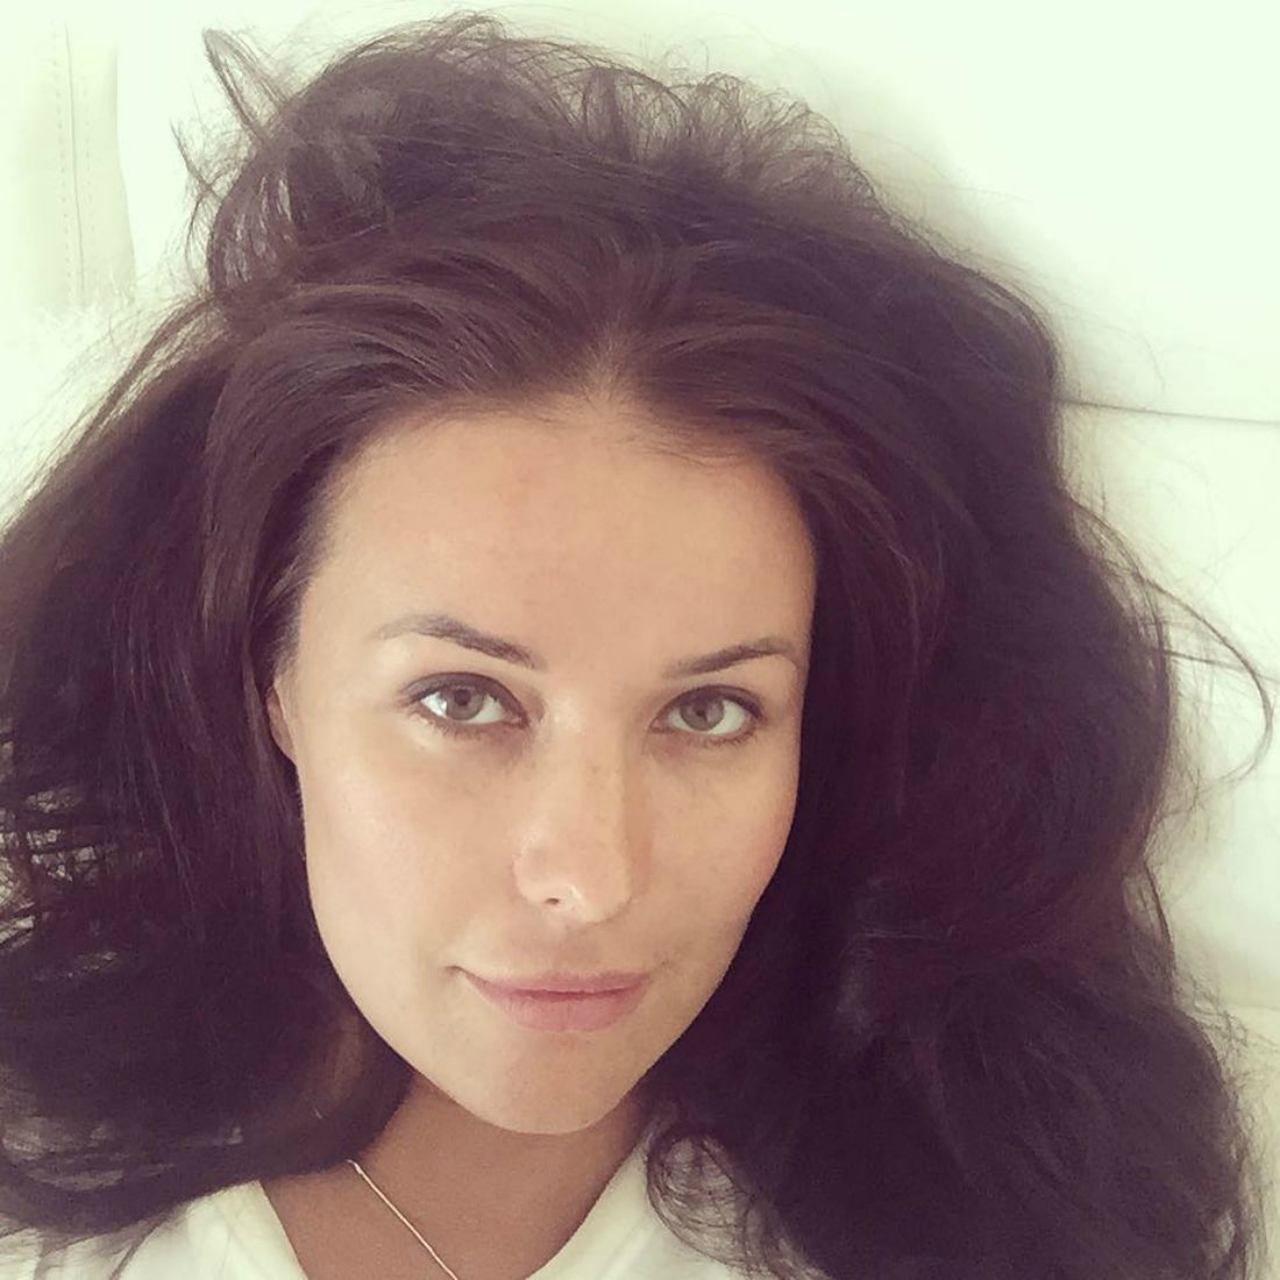 Оксана Федорова без макияжа выглядит моложе